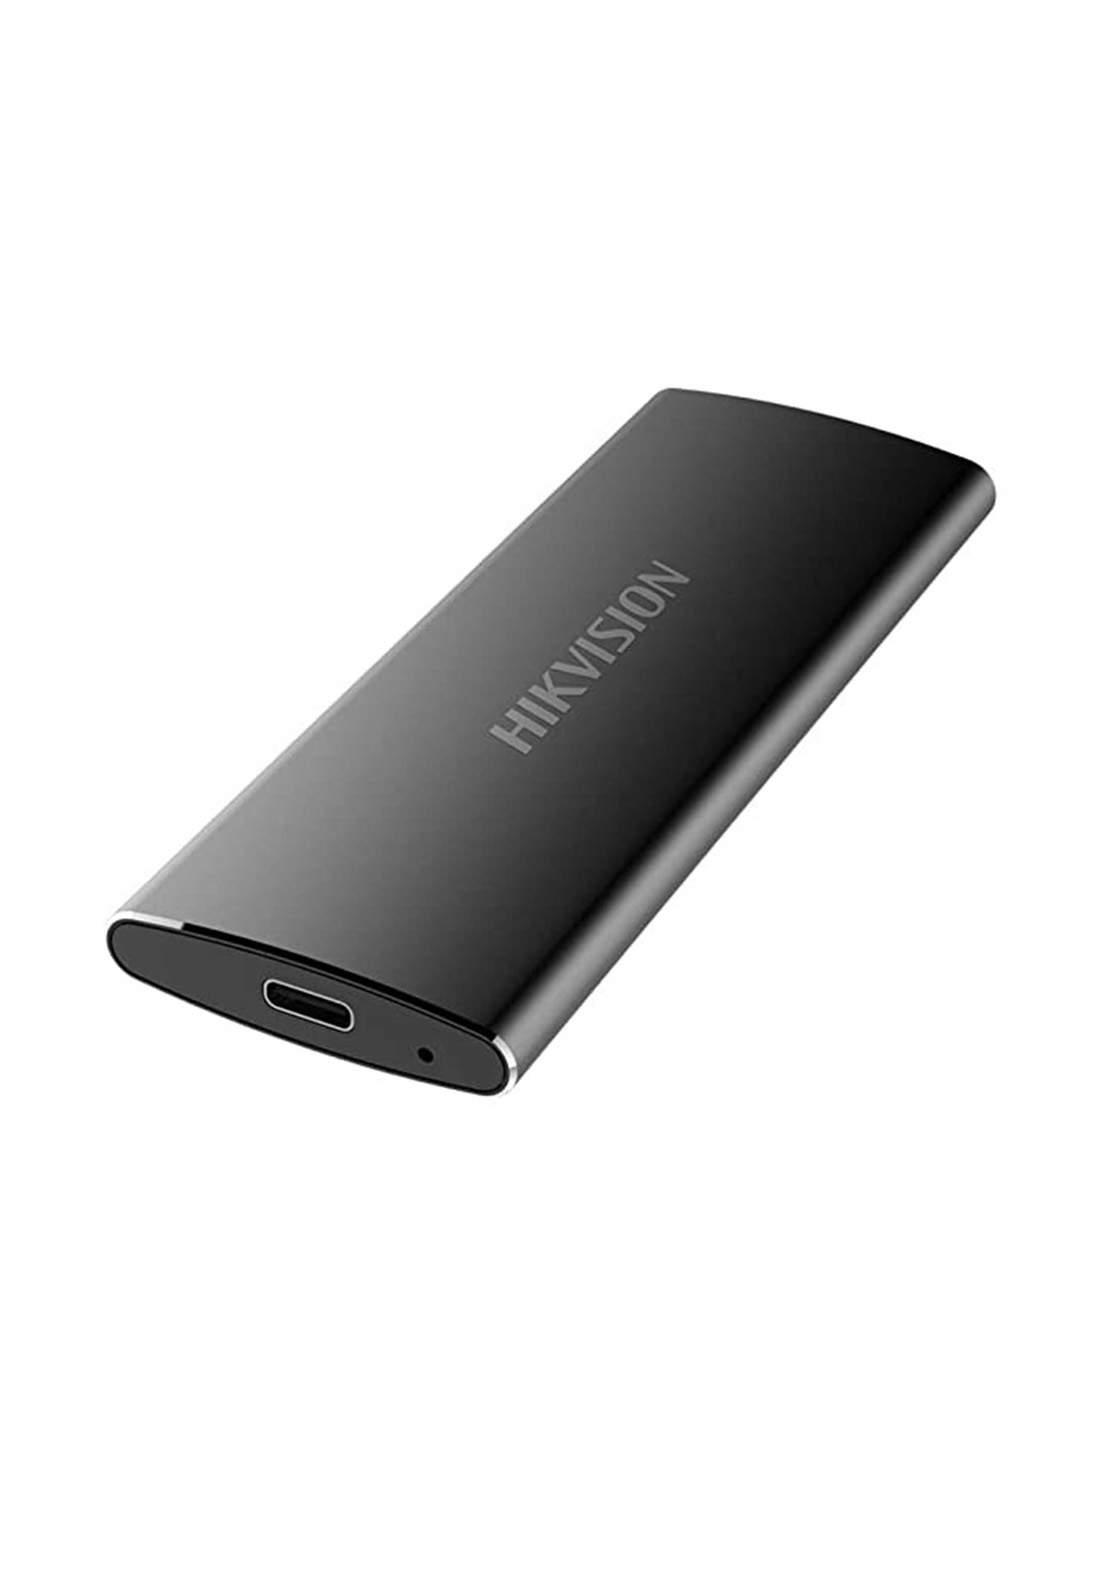 Hikvision T200N External SSD HS-ESSD 1TB - Black هارد خارجي